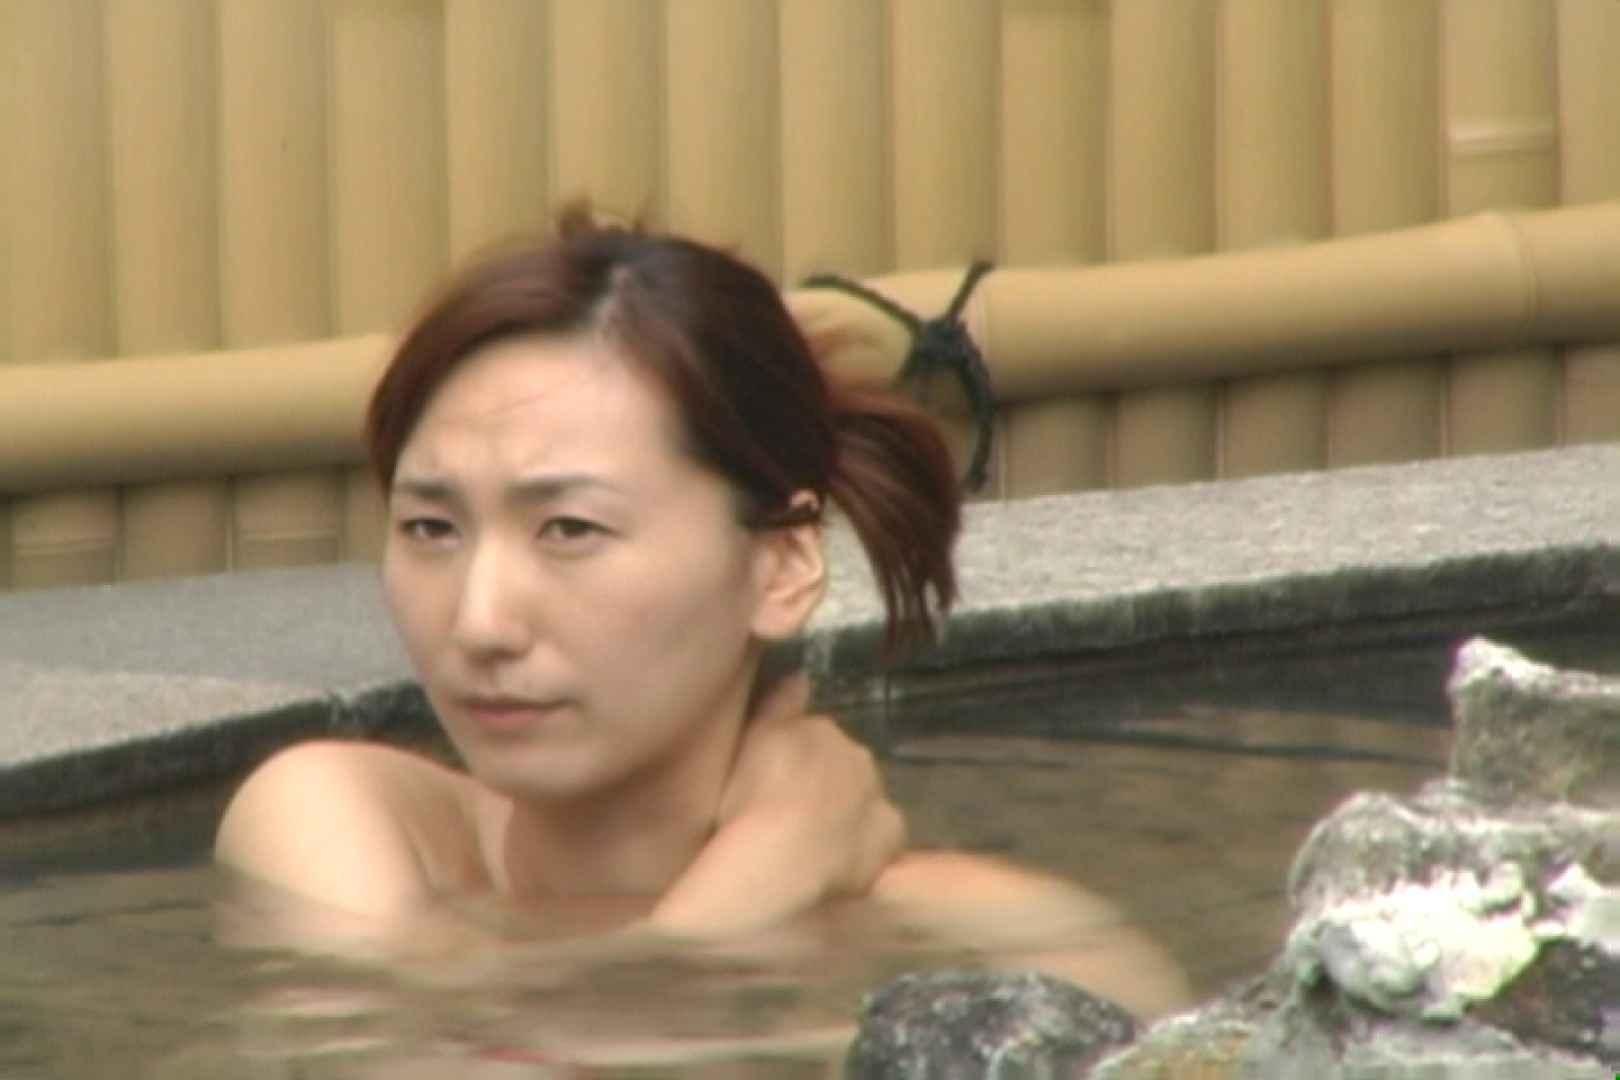 Aquaな露天風呂Vol.616 露天風呂編   盗撮シリーズ  89PIX 23